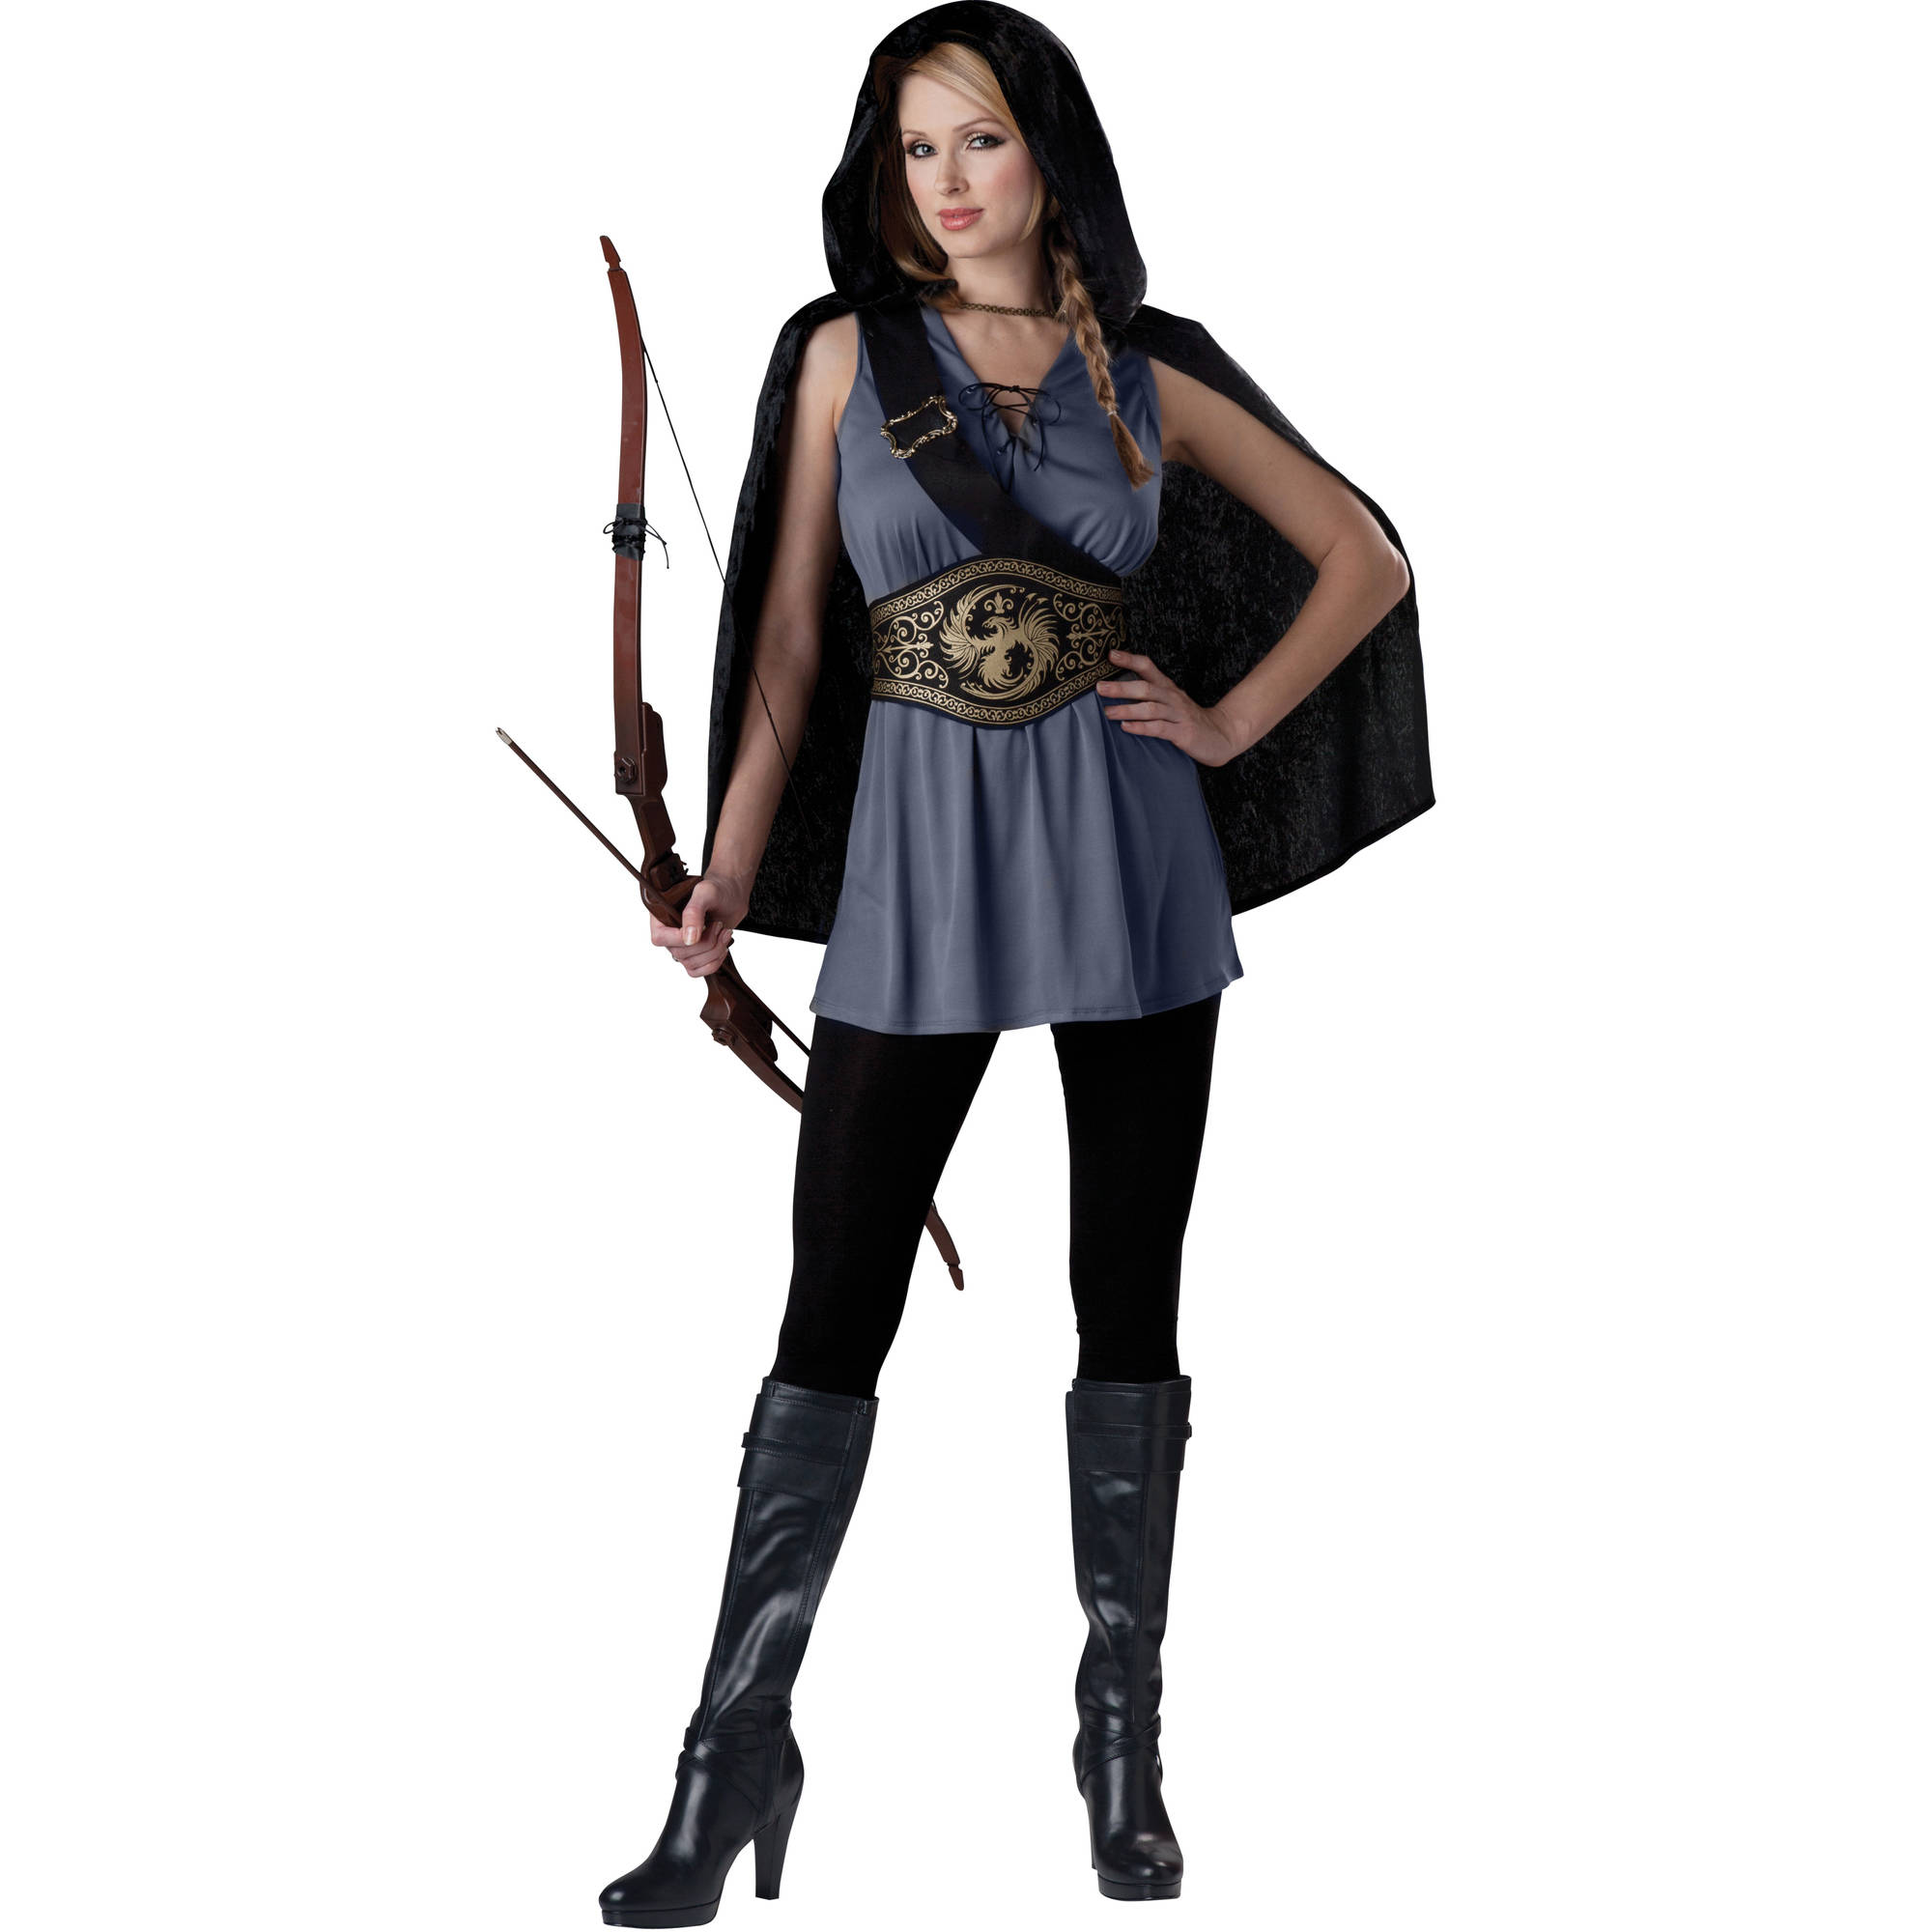 Woodland Huntress Women's Adult Halloween Costume